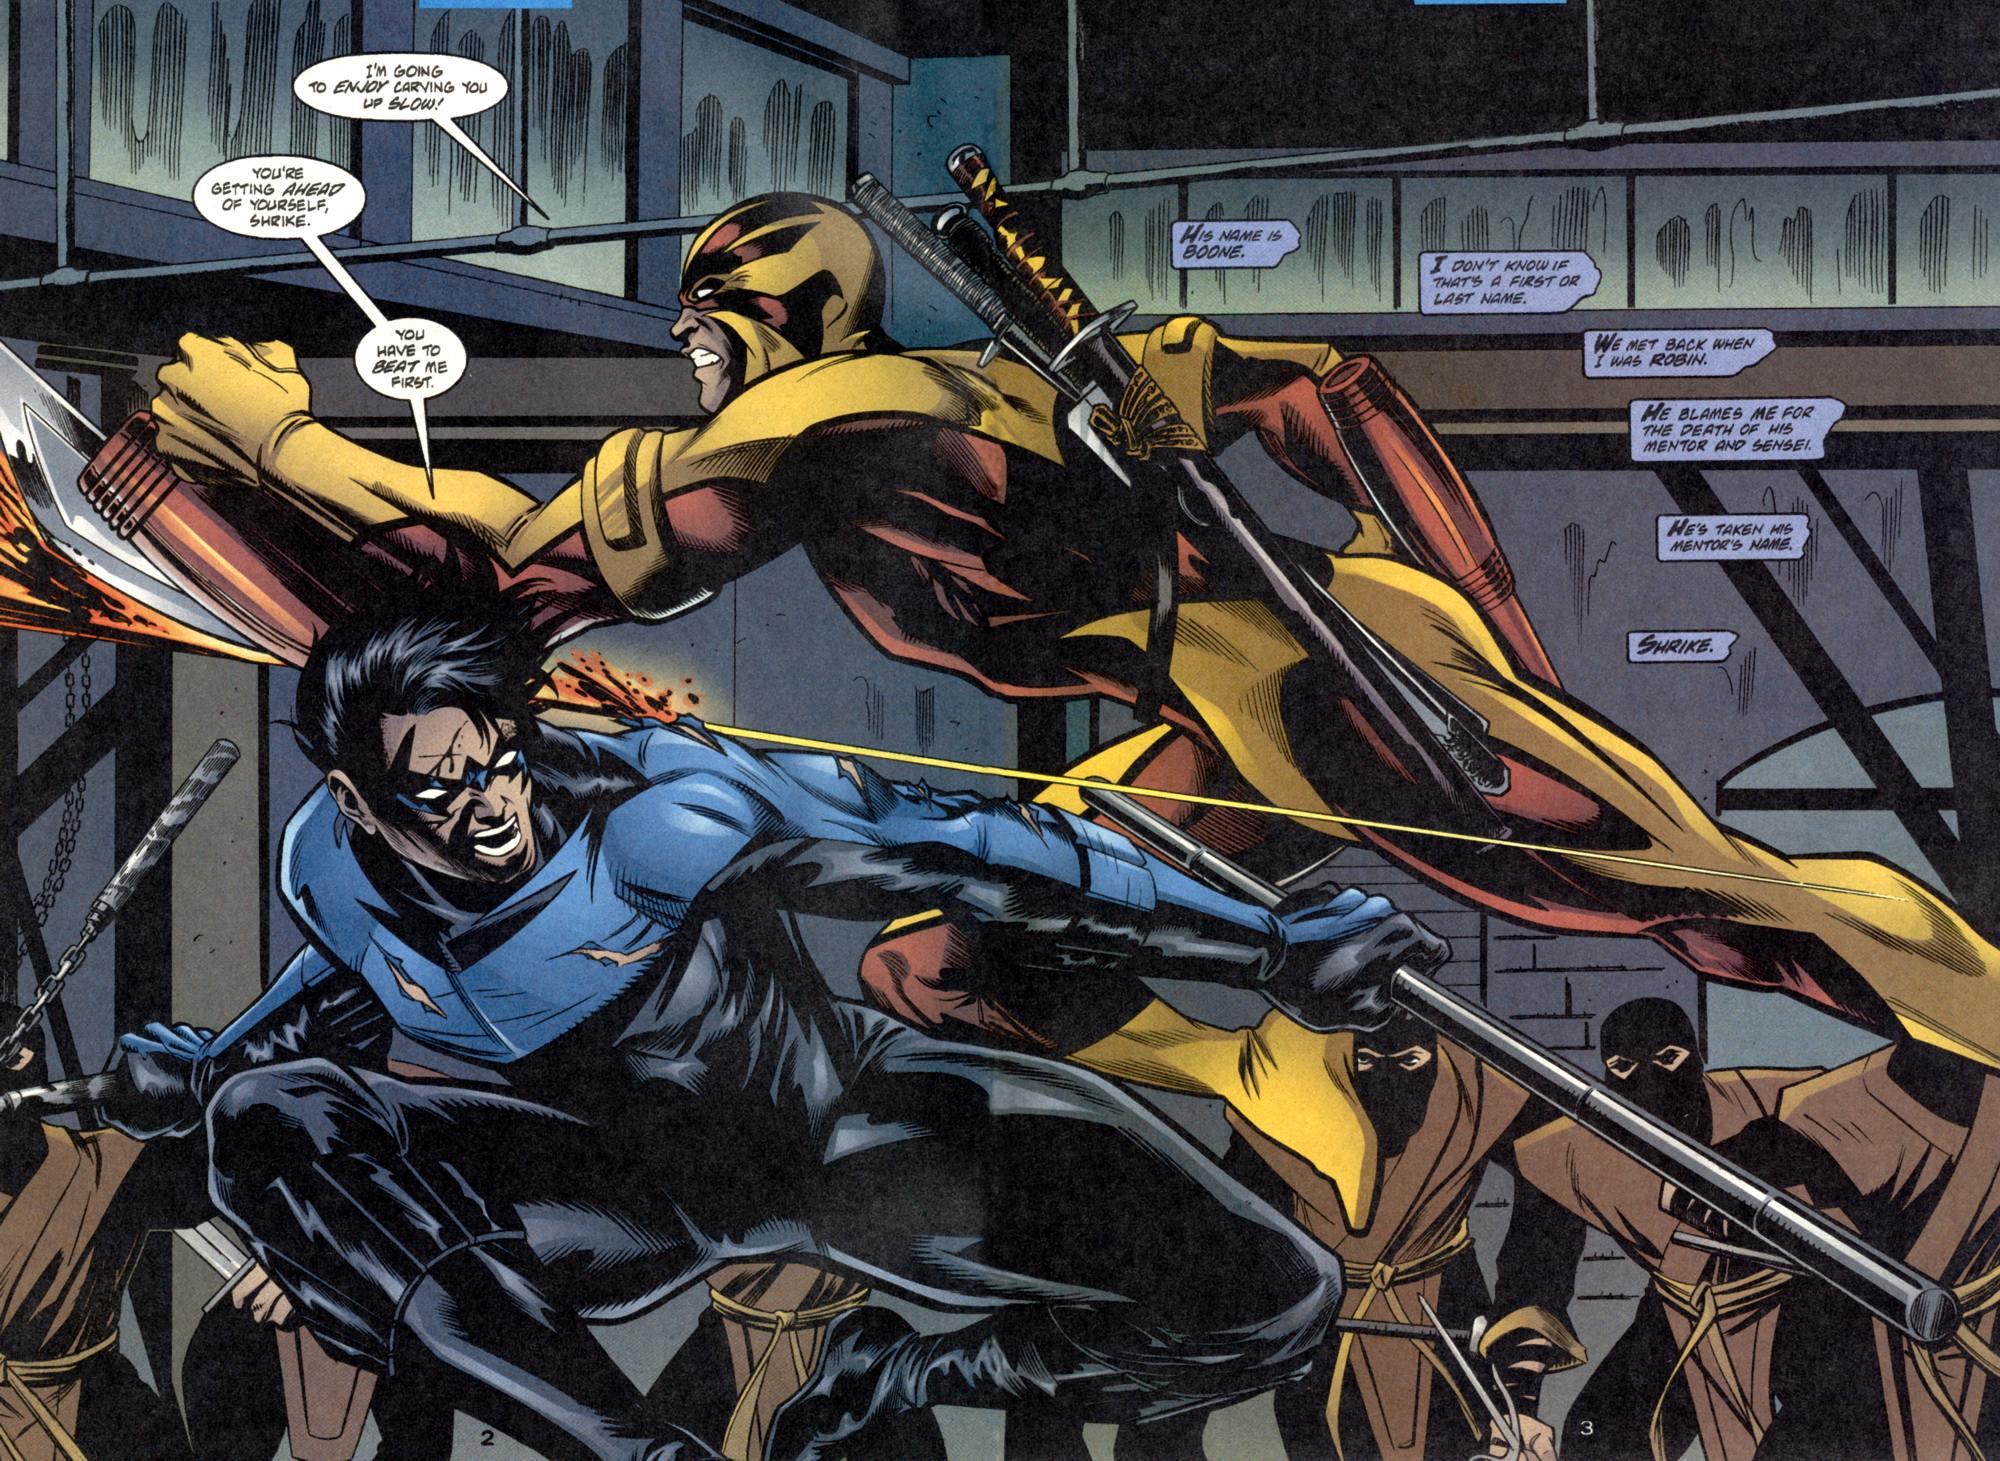 d02_03 Nightwing Shrike Boone.JPG